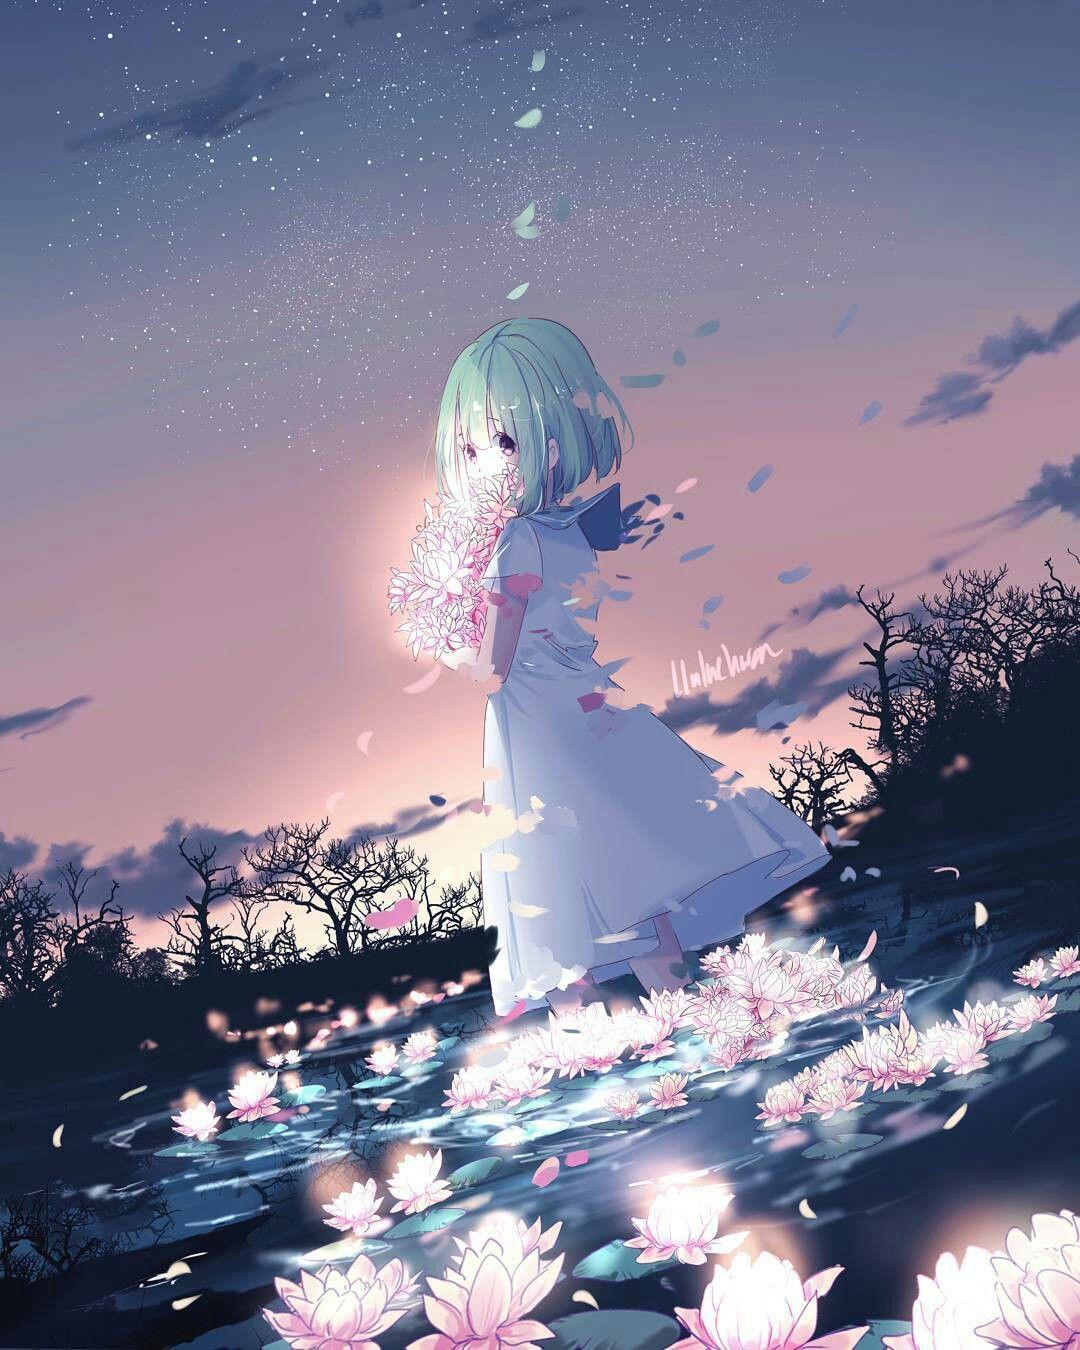 Univers Anime Manga: Artist: ルルー @lluluchwan